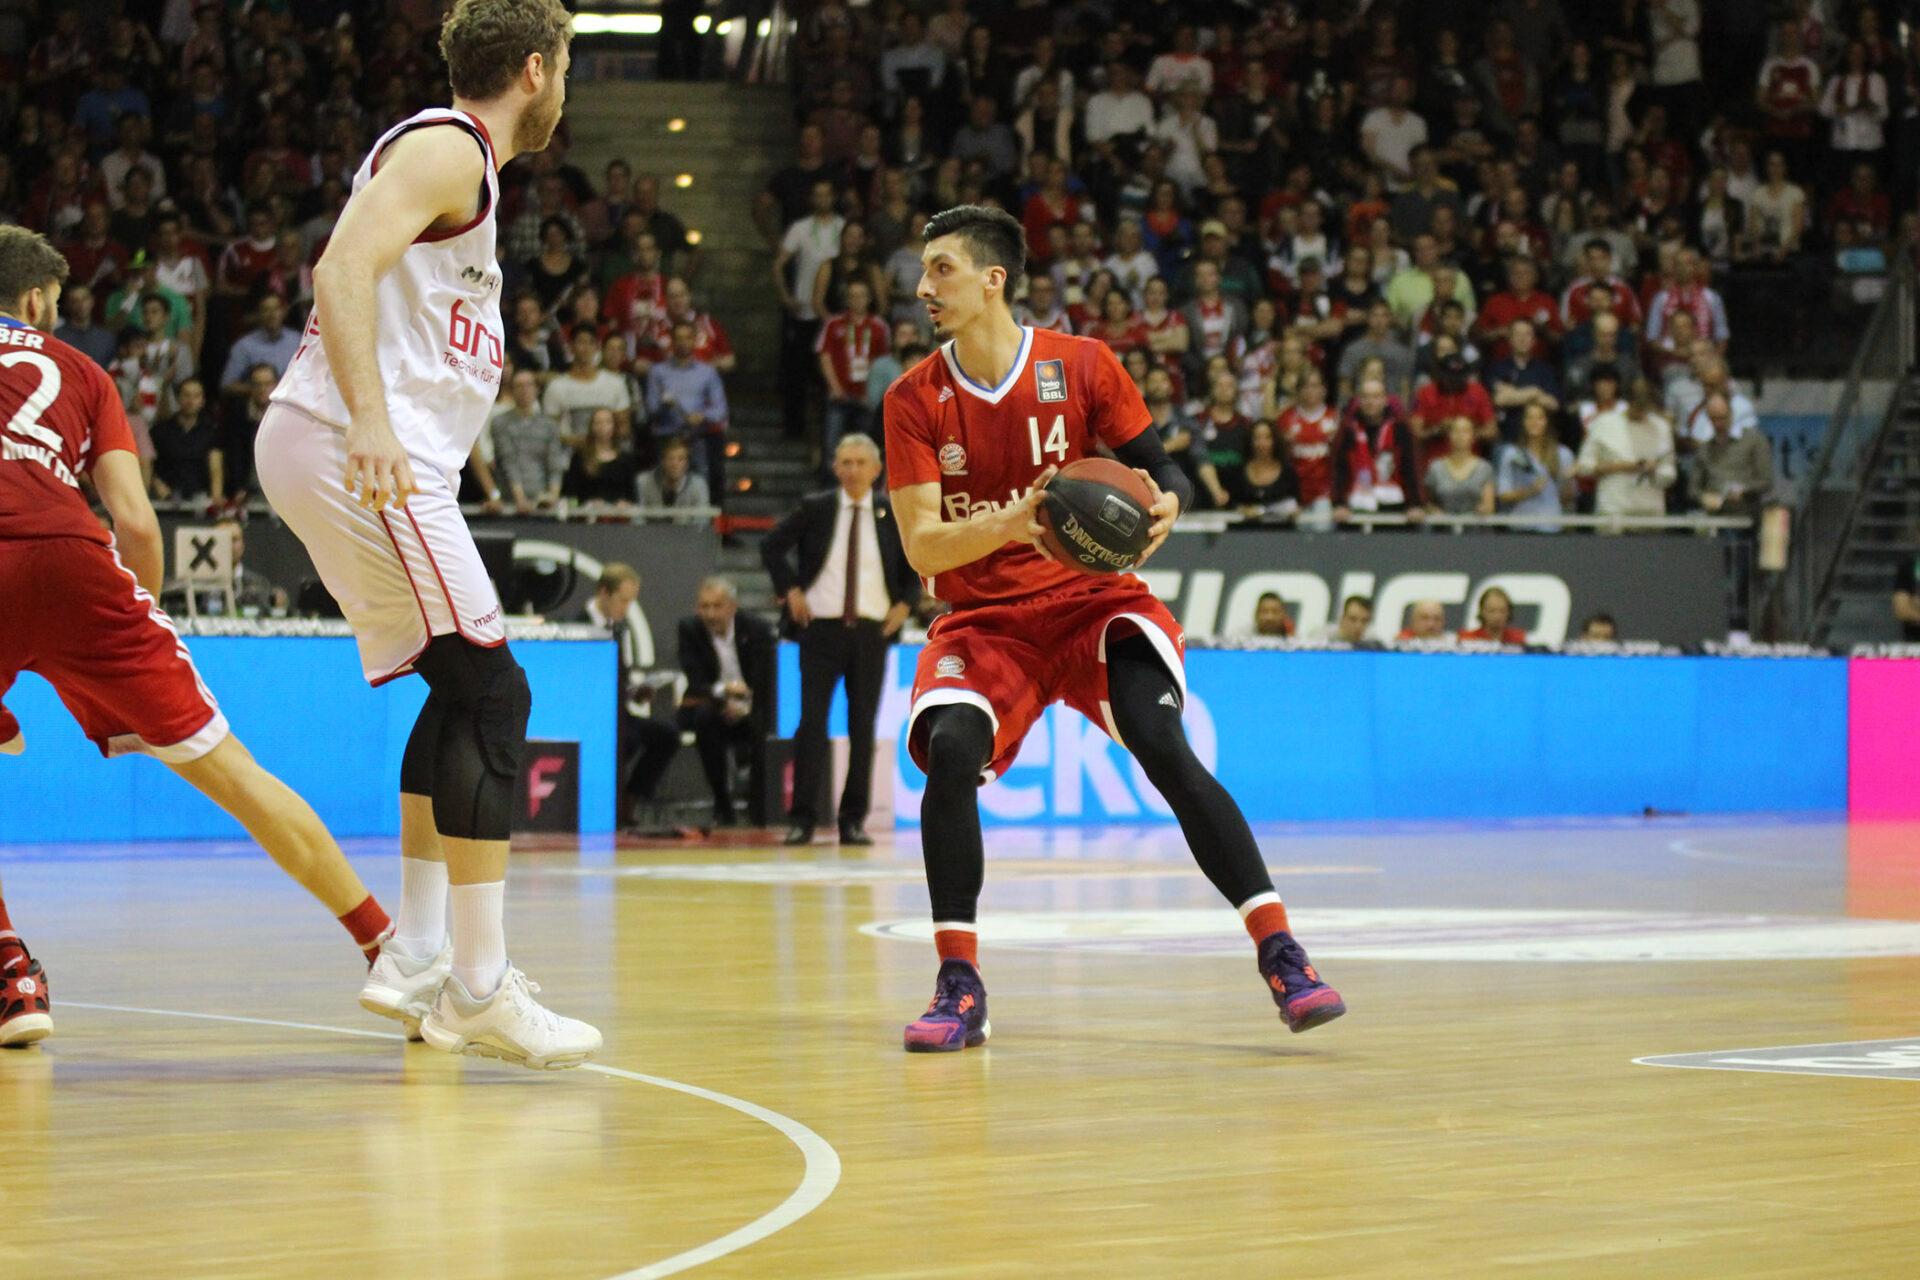 Rundt om Runden: EuroLeague runde 8